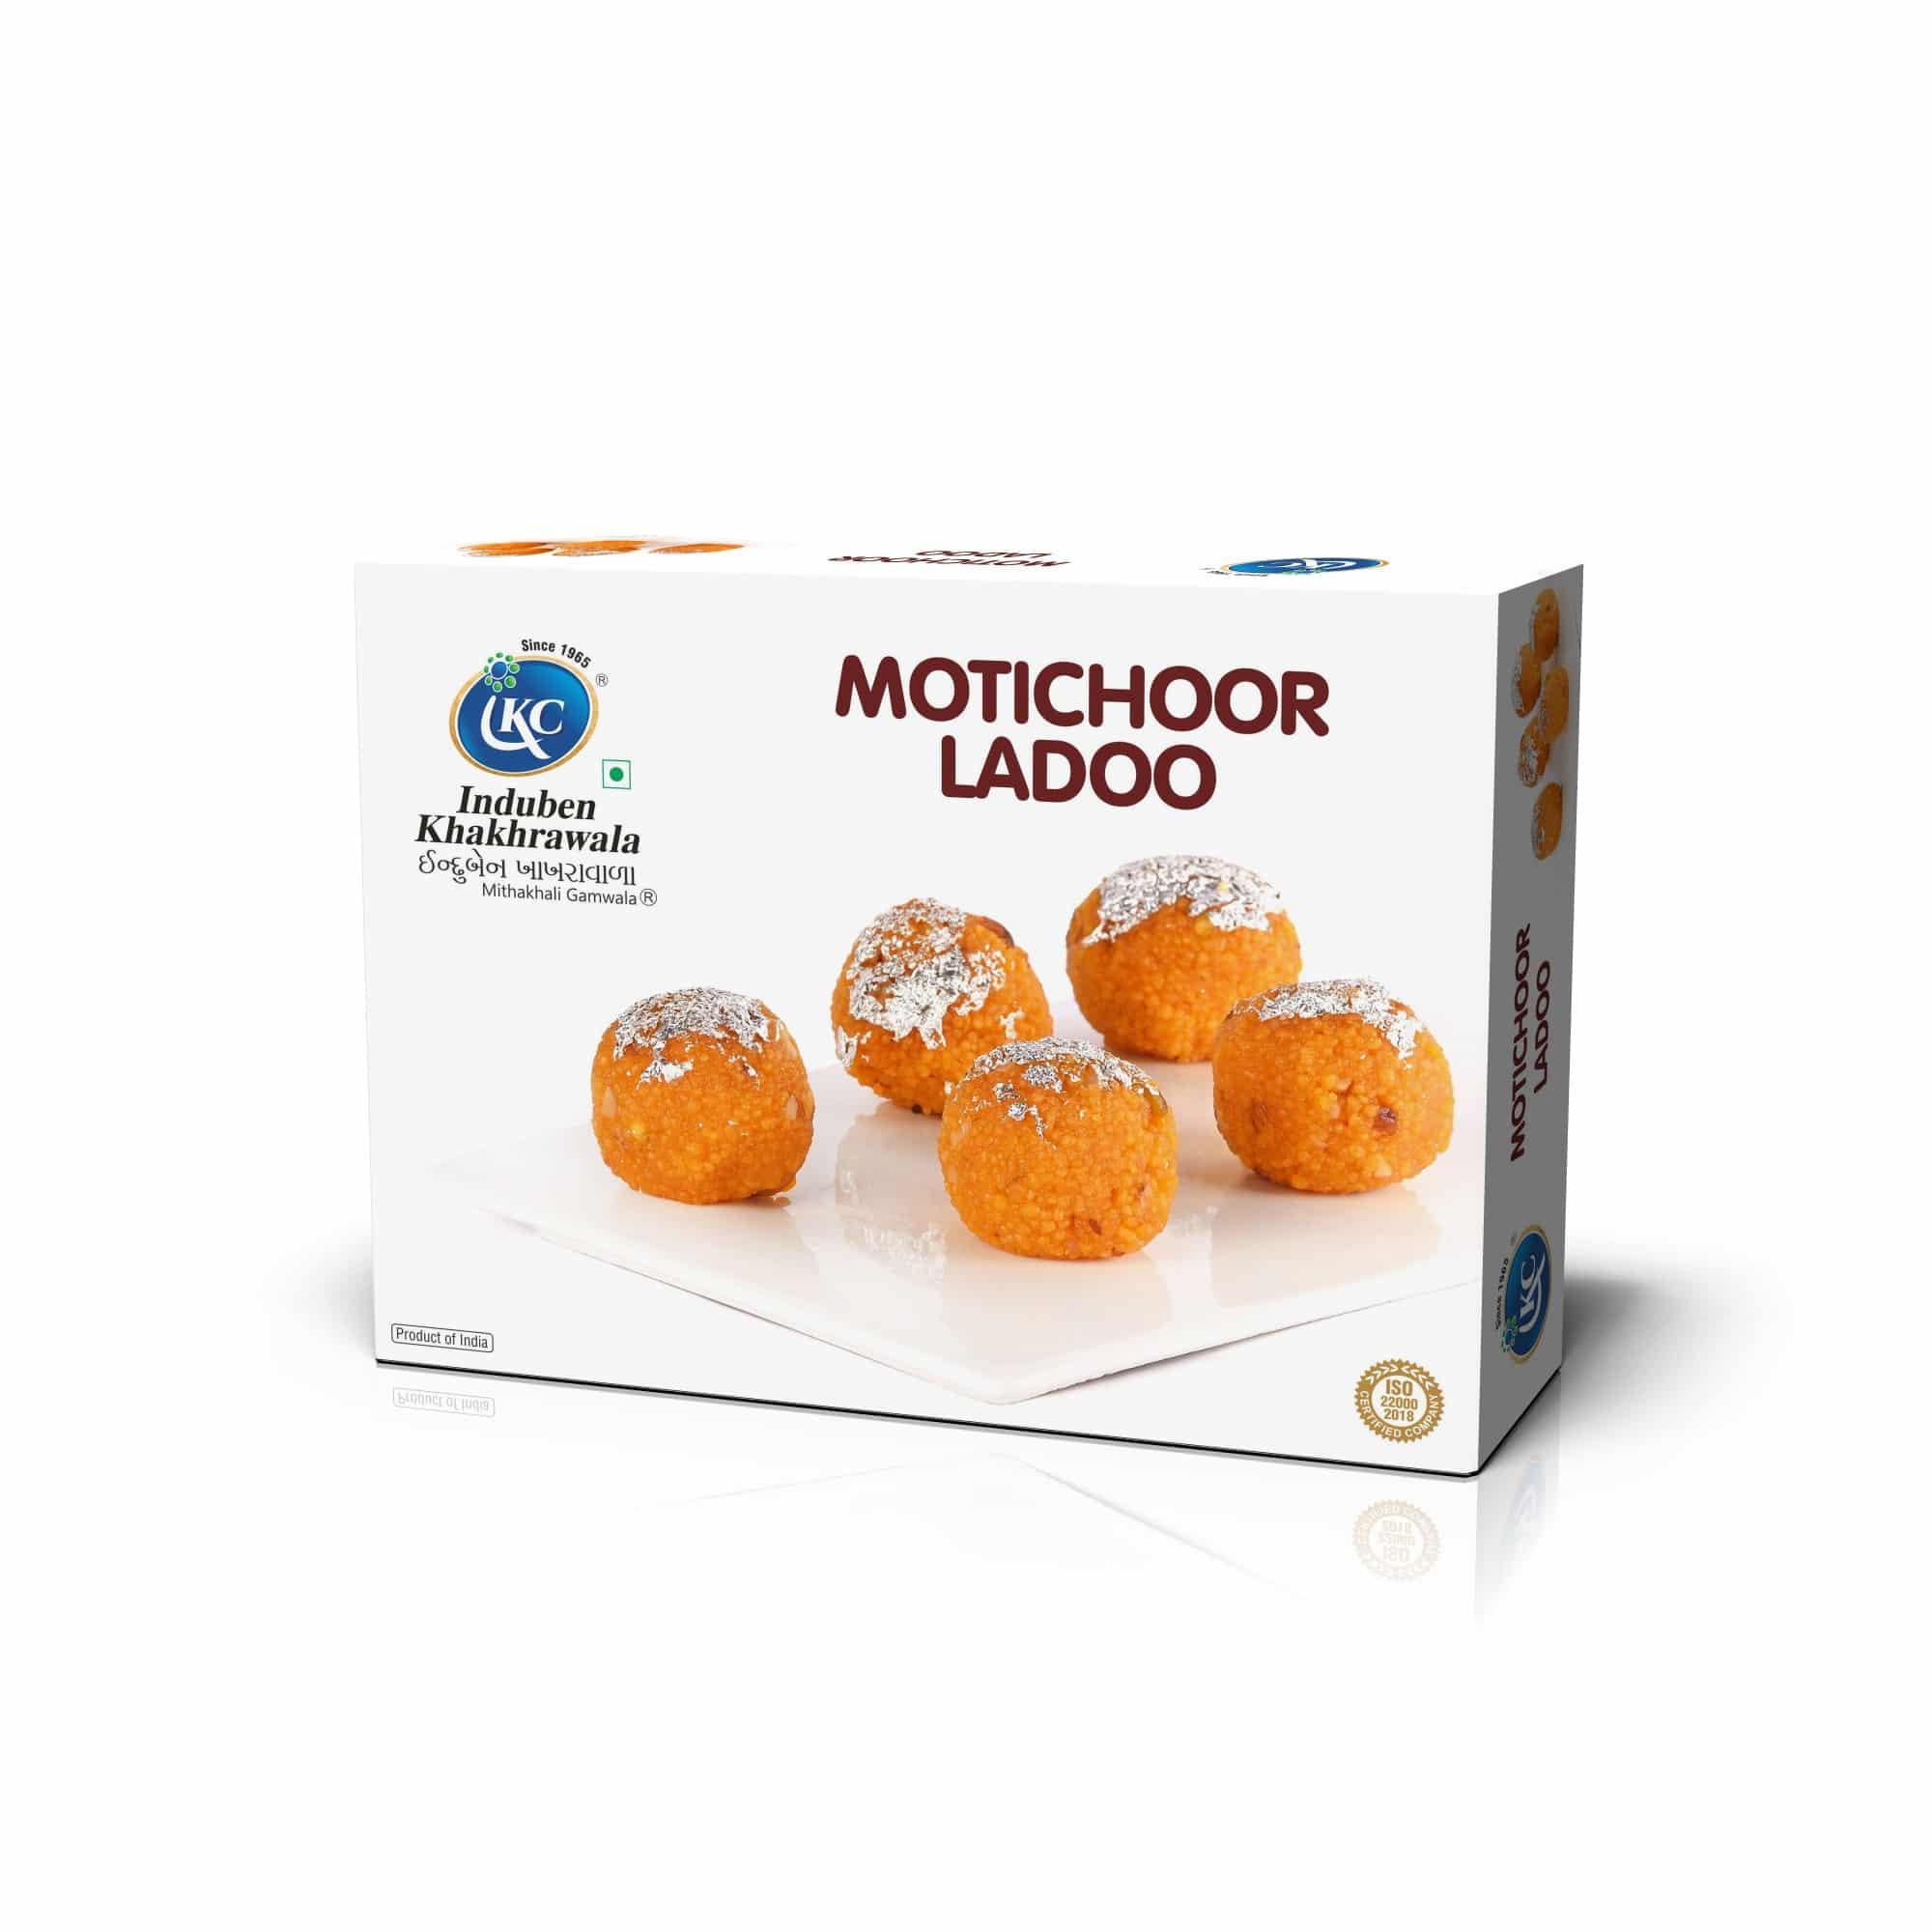 Buy Online Motichoor Laddoo | Induben Khakhrawala | Traditional Indian Sweets From Induben, Get Latest Price & Recipe Of Motichoor Laddoo Sweets.